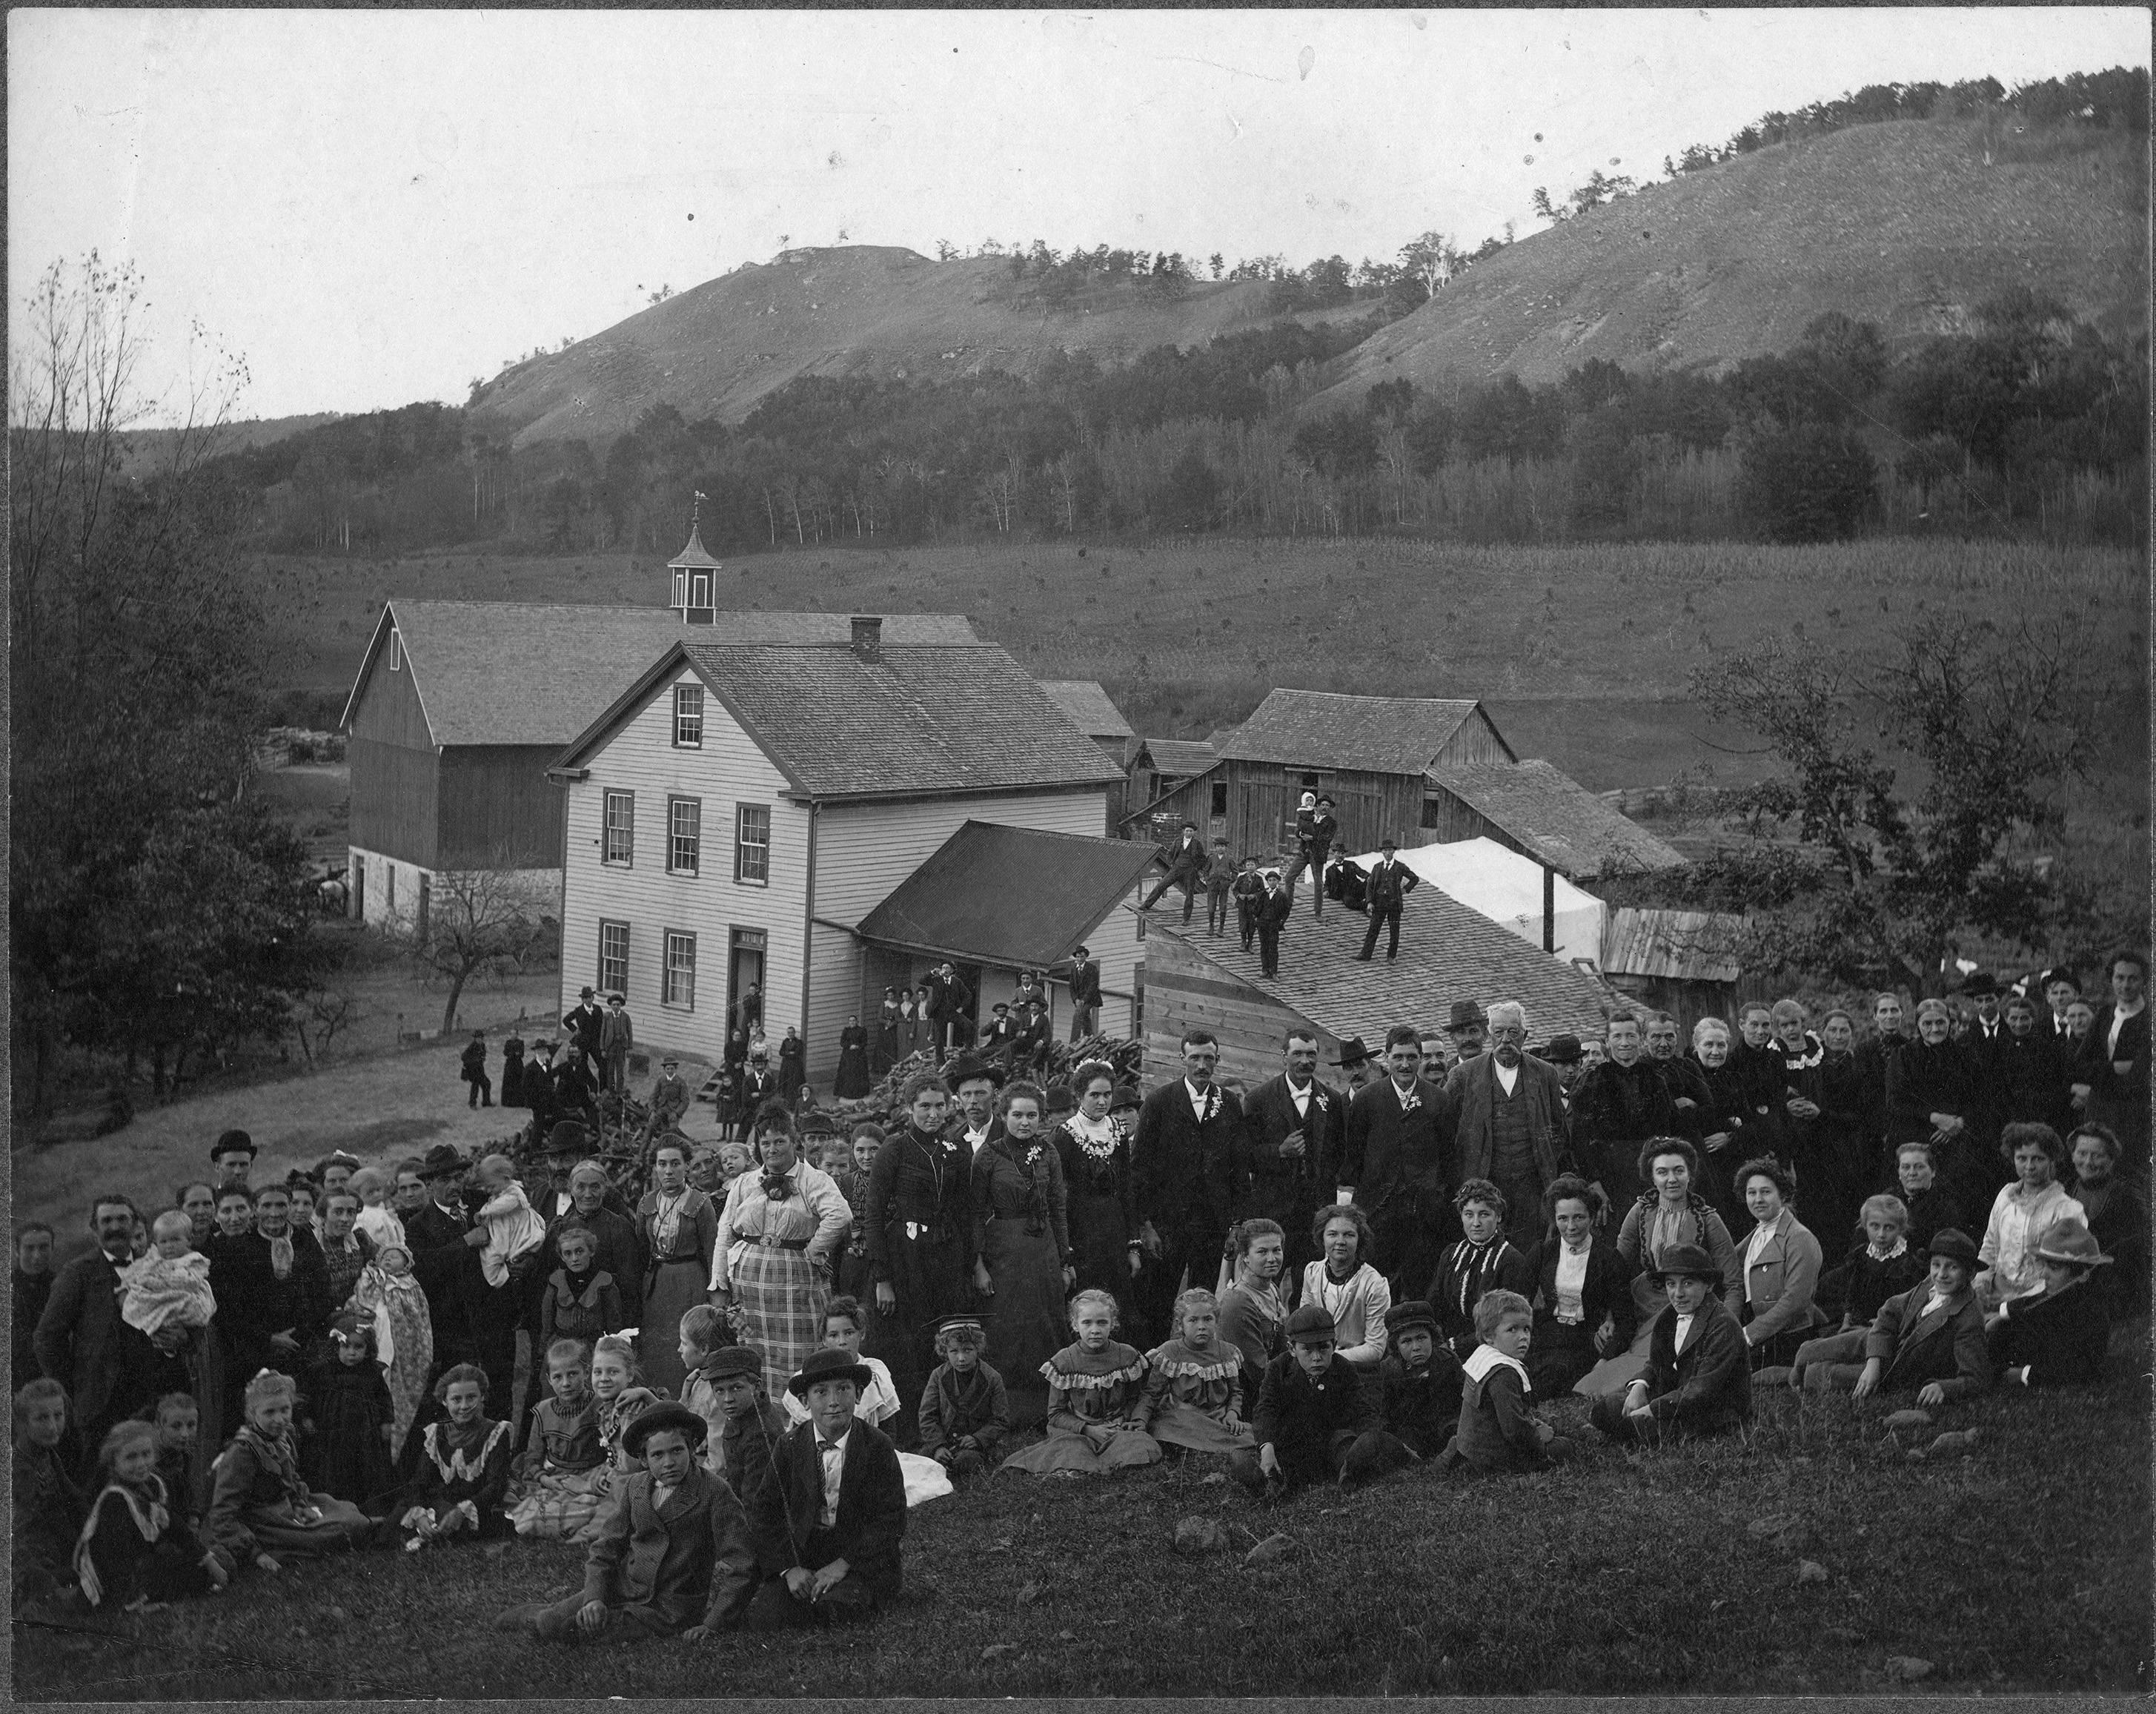 Old_fashioned_wedding_Rosalia_Washington_circa_1880